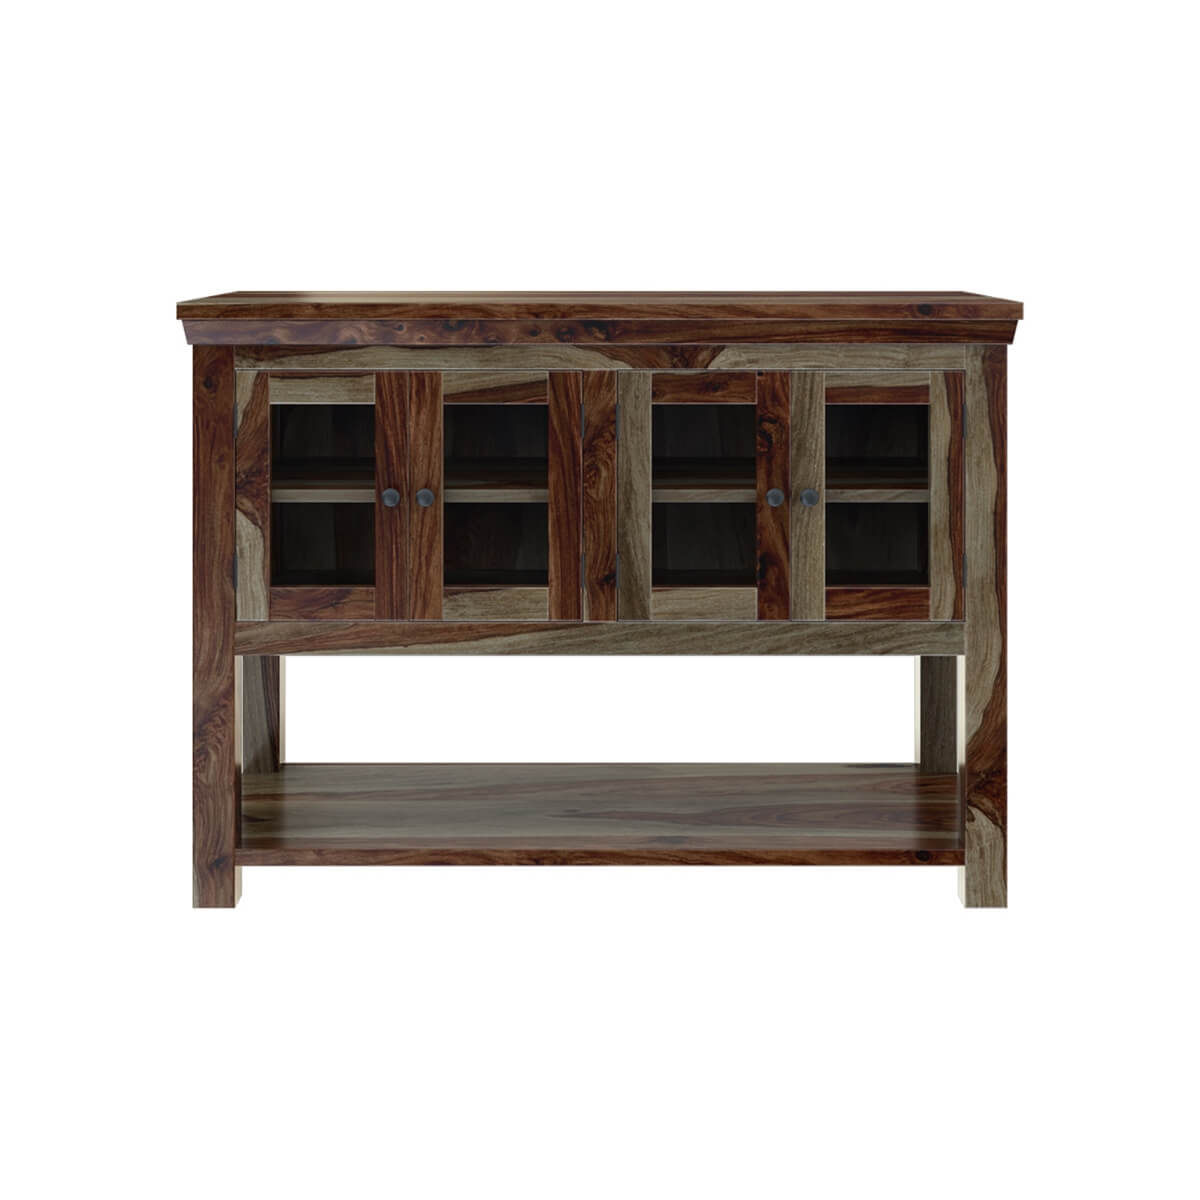 Modern Rustic Sierra Solid Wood Dining Buffet Table - Rustic Sierra Solid Wood Dining Buffet Table